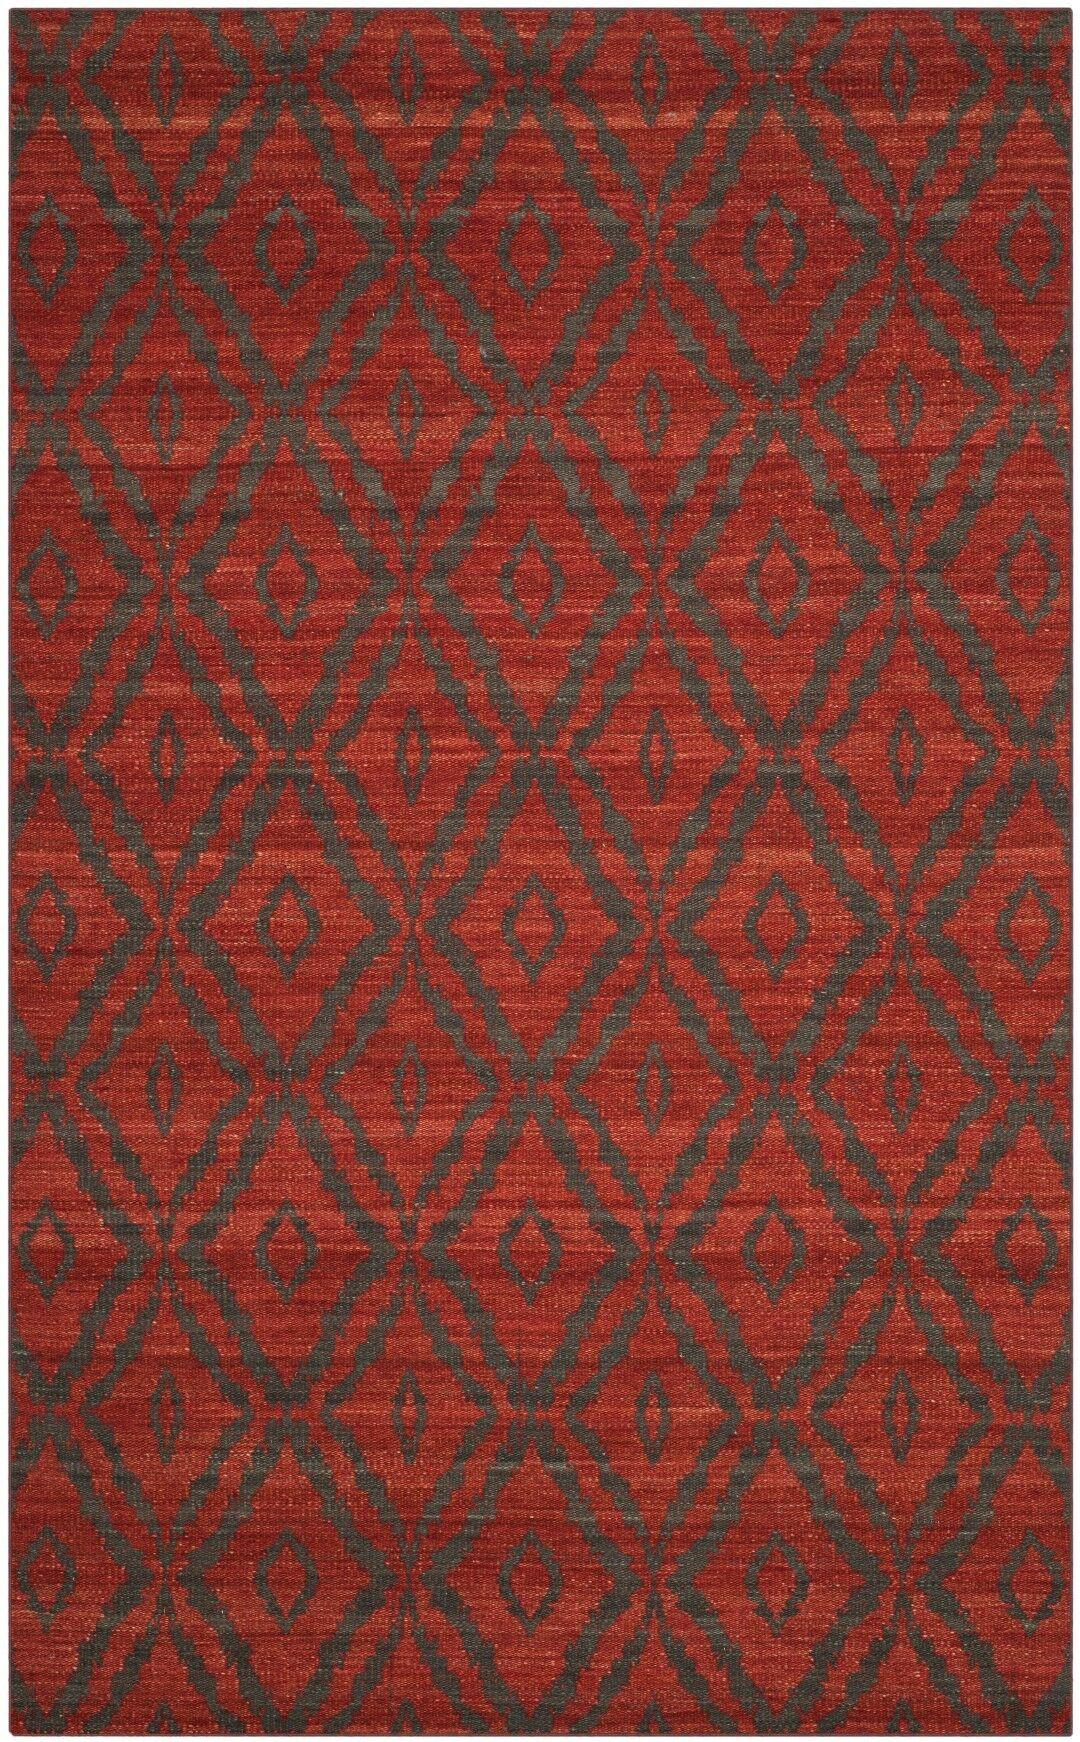 Sneyd Park Hand-Woven Area Rug Rug Size: Rectangle 5' x 8'